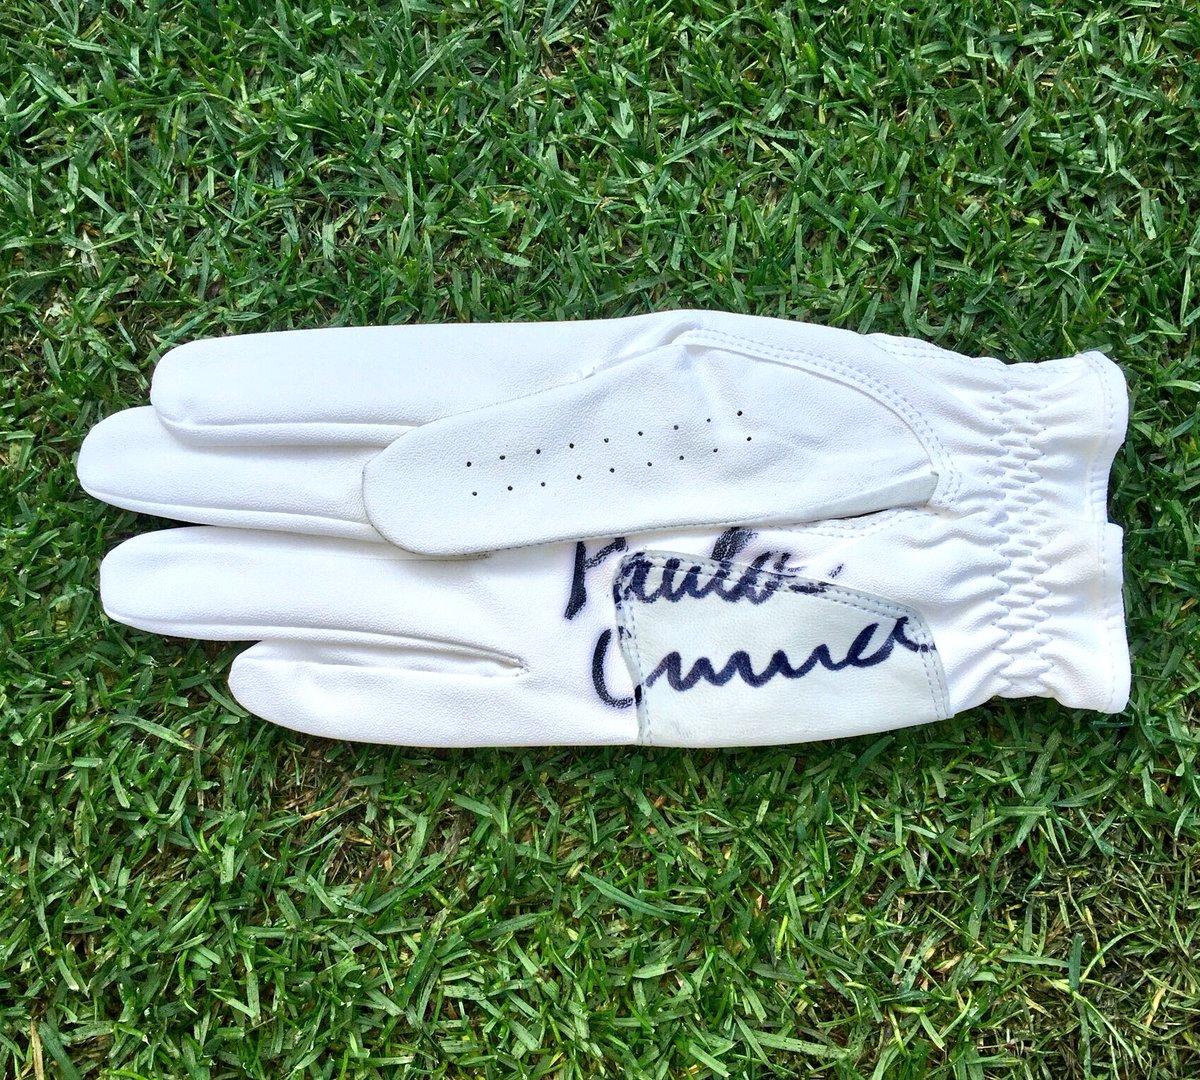 Fan of @ThePCreamer??   Follow & RT to win 1 of 4 signed gloves! https://t.co/G7x0EaQCJZ